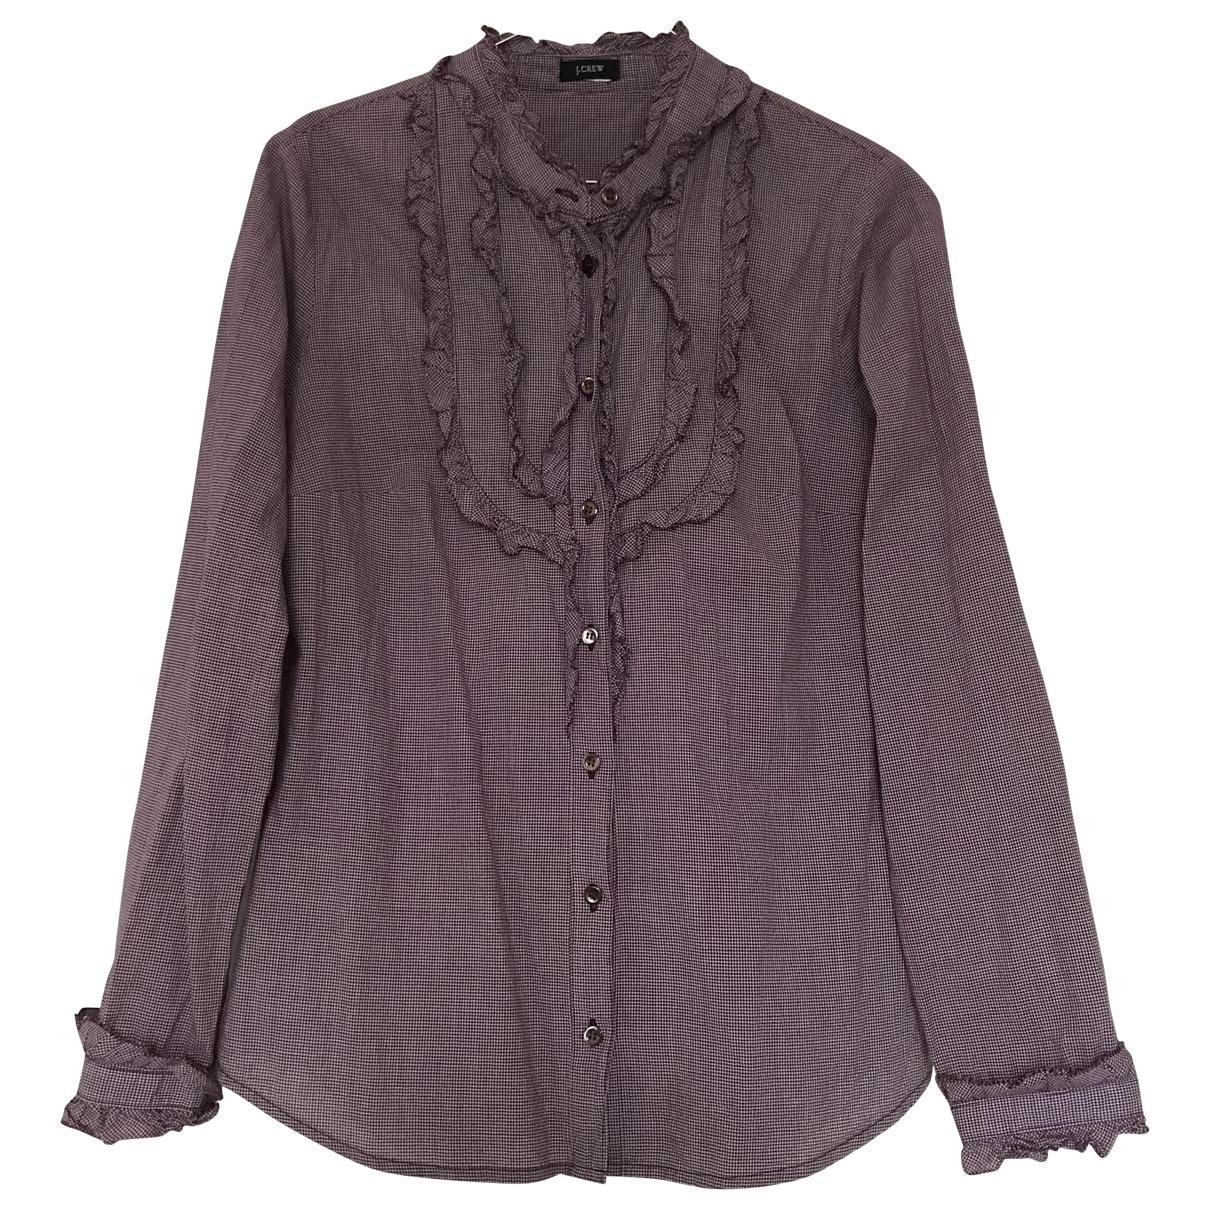 J.crew \N Purple Cotton  top for Women S International